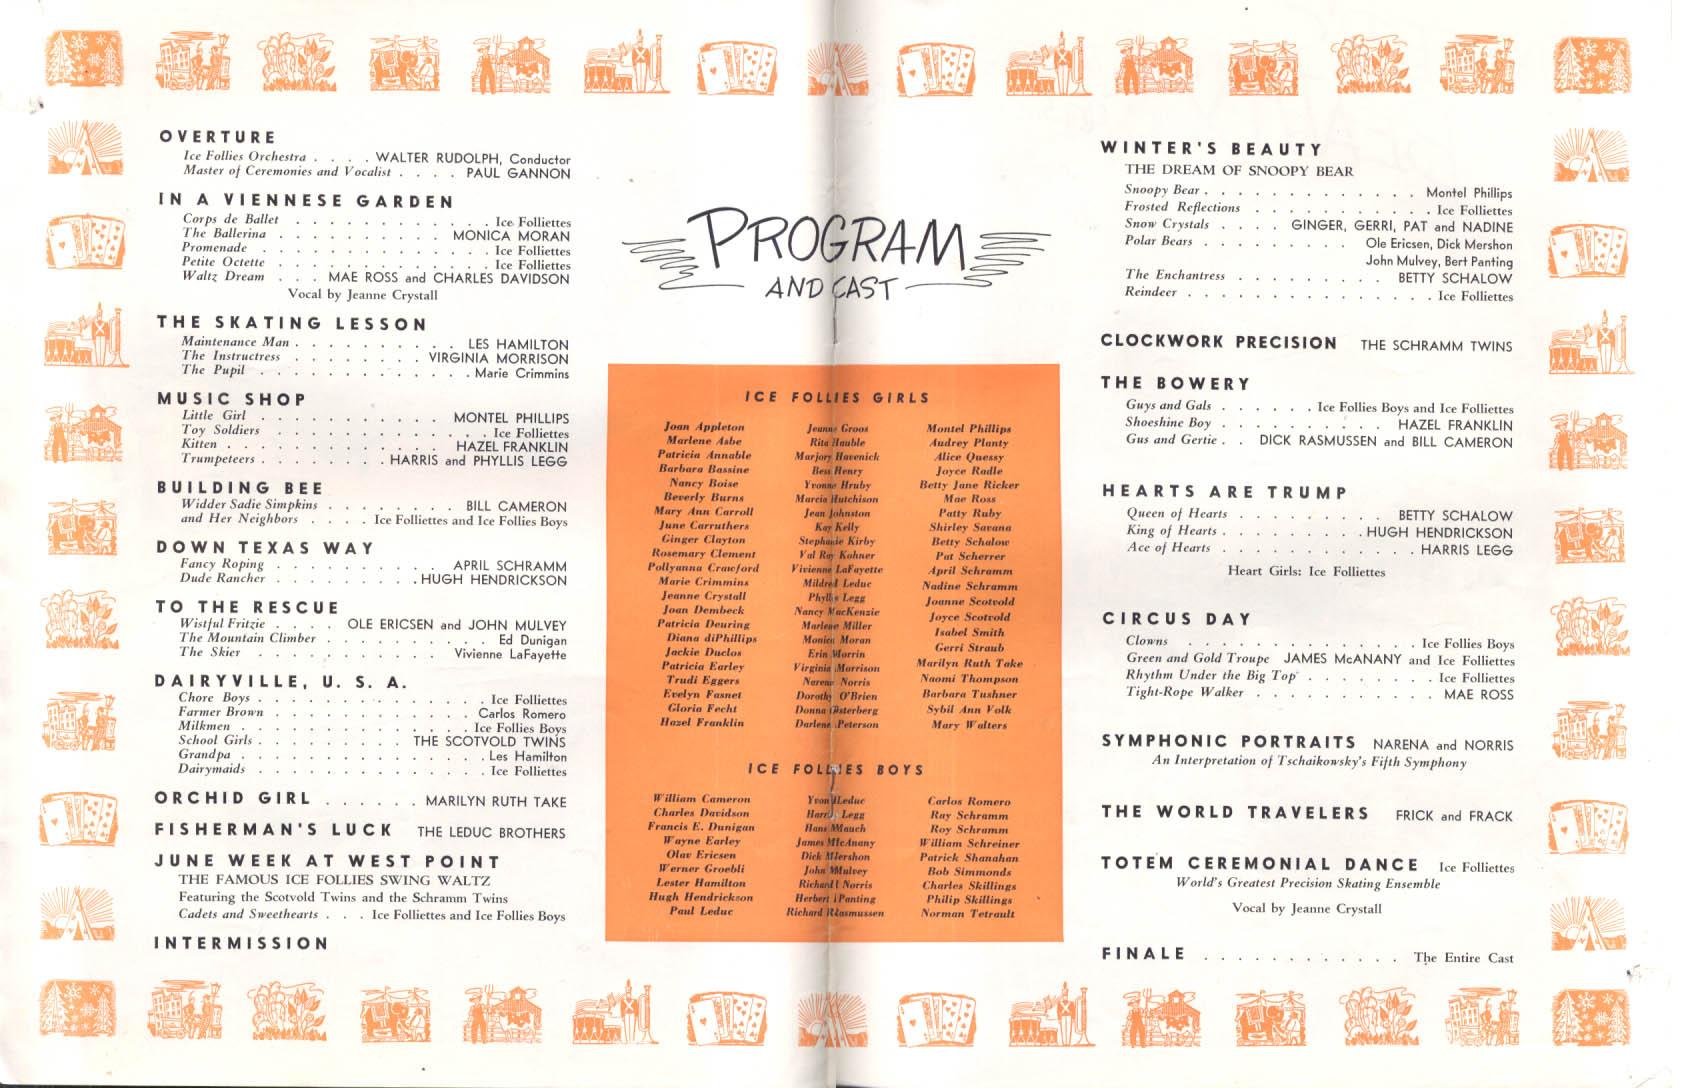 Shipstads & Johnson Ice Follies of 1950 Souvenir Program